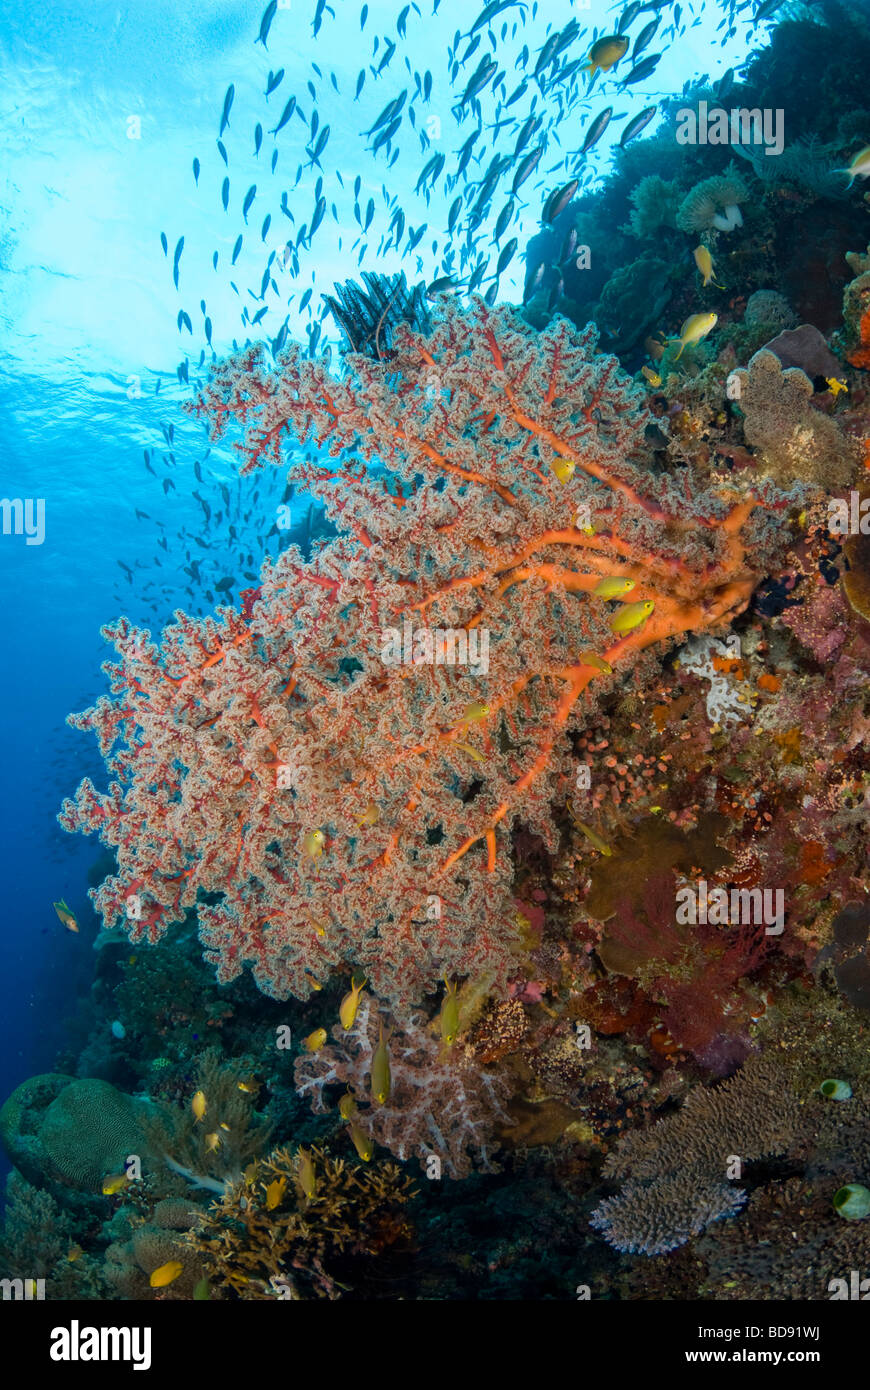 Philippine coral gardens, Cabilao, Philippines - Stock Image